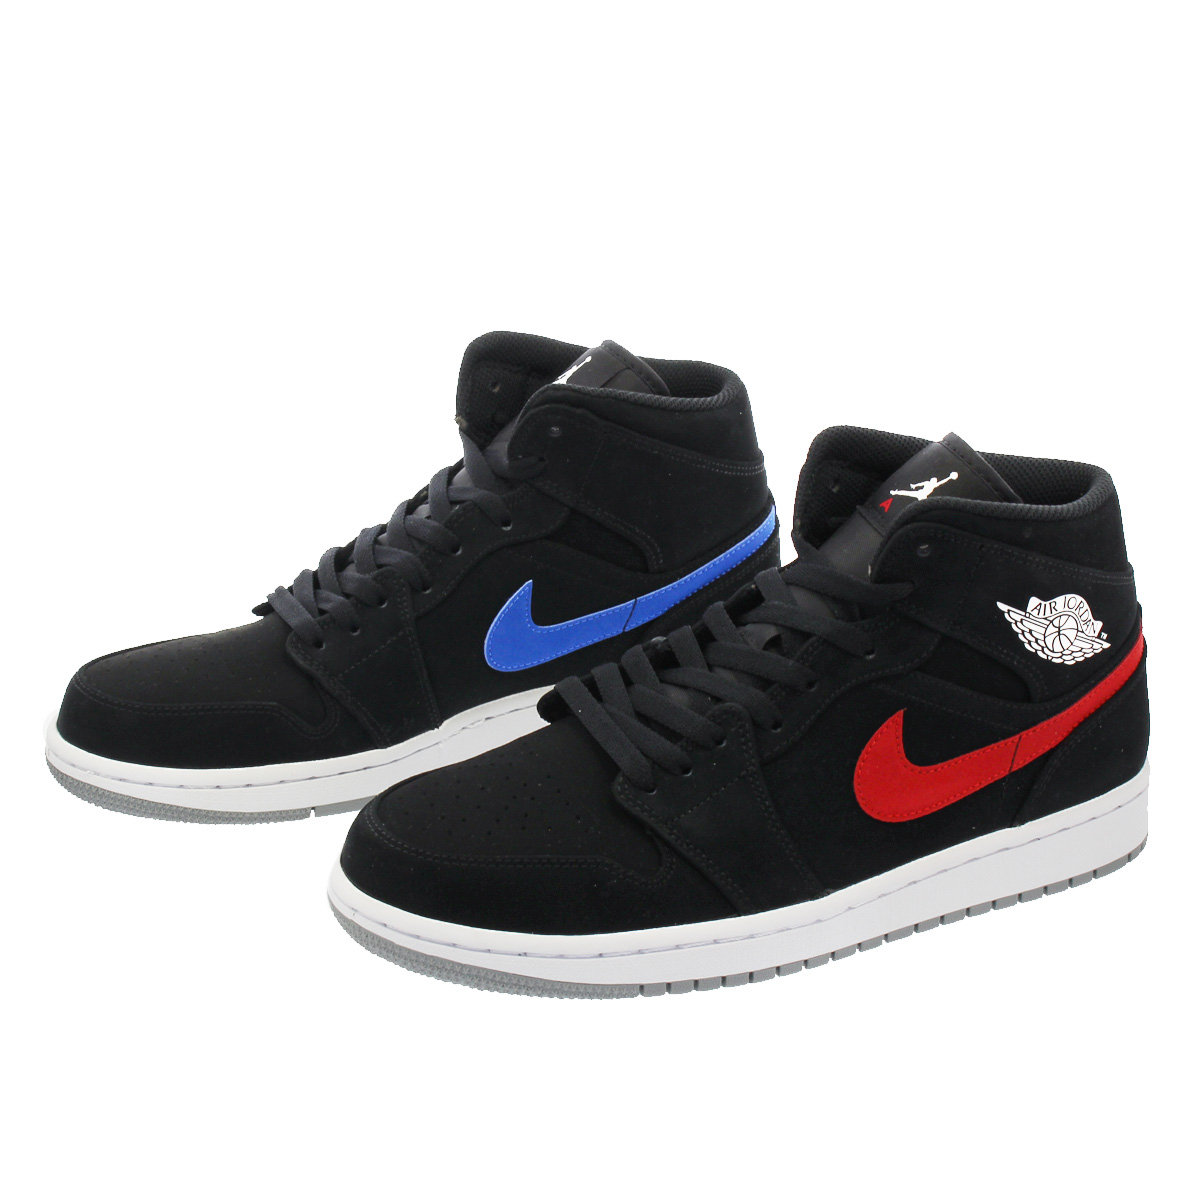 8a5a5c94d1f LOWTEX BIG-SMALL SHOP: NIKE AIR JORDAN 1 MID Nike Air Jordan 1 mid ...